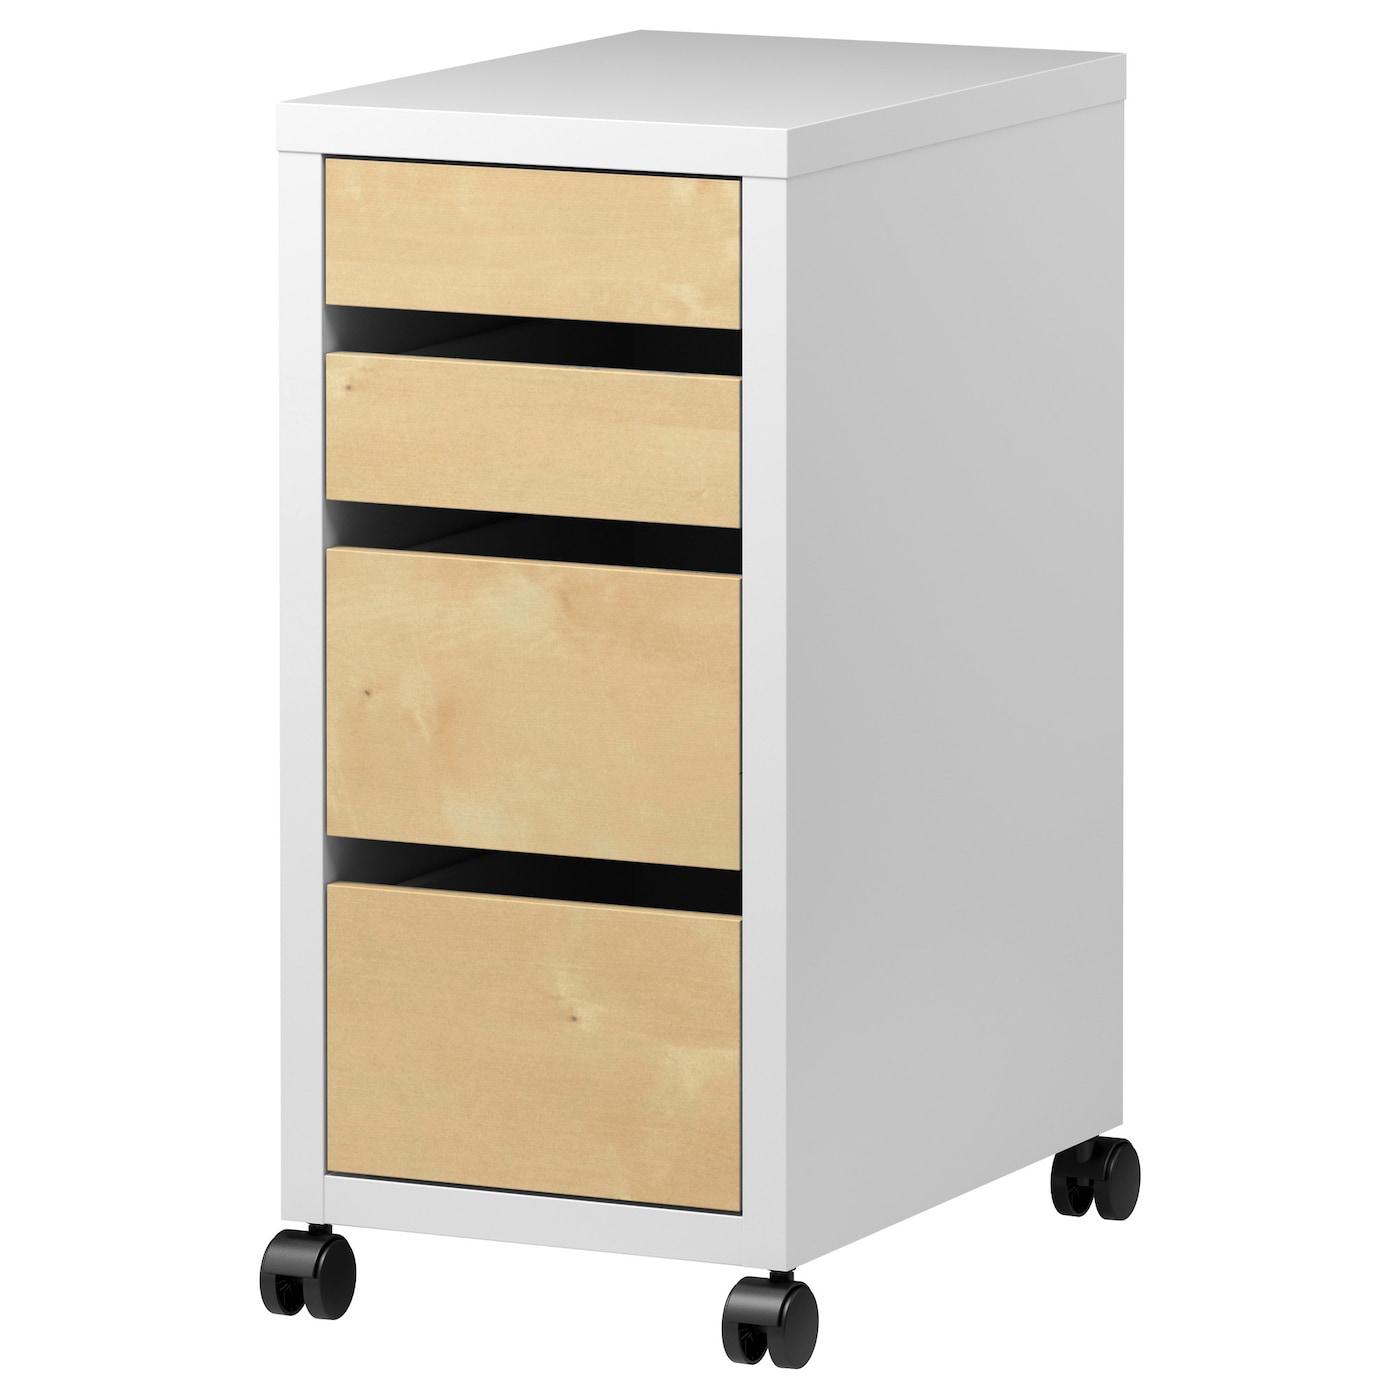 micke ladeblok op wielen wit berkenpatroon 35 x 75 cm ikea. Black Bedroom Furniture Sets. Home Design Ideas